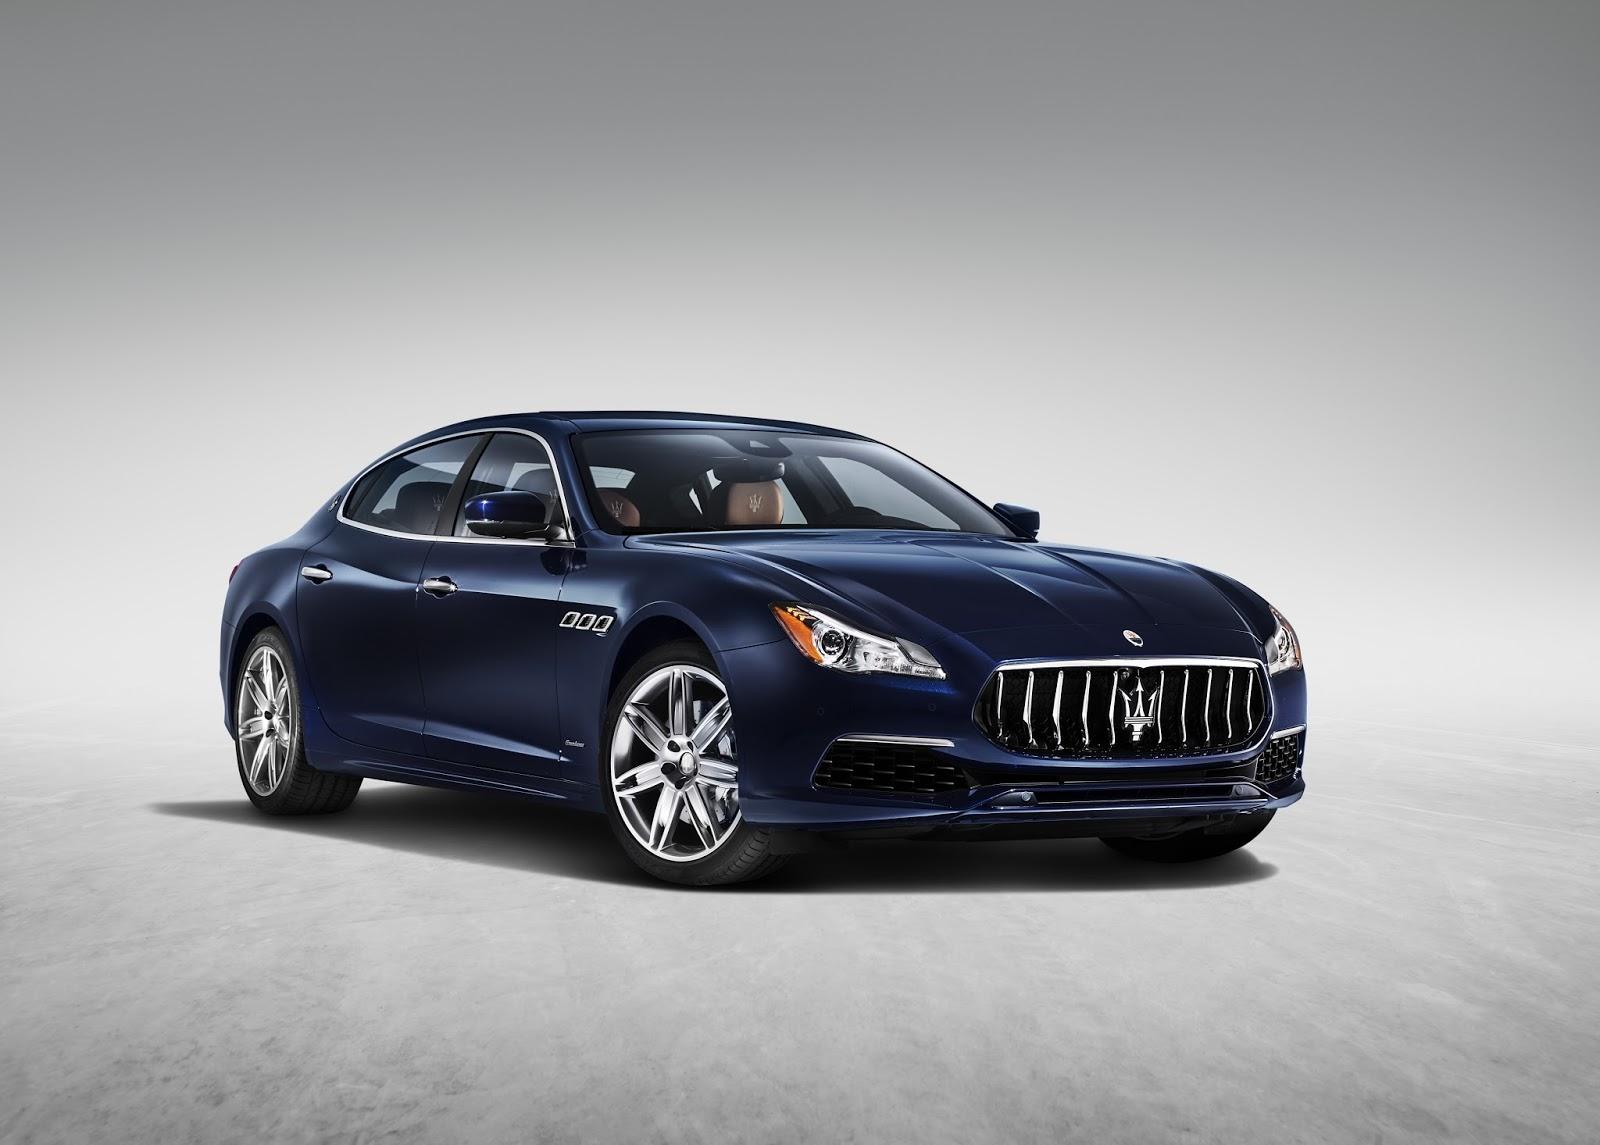 Maserati Quattroporte Facelift (2017) 4